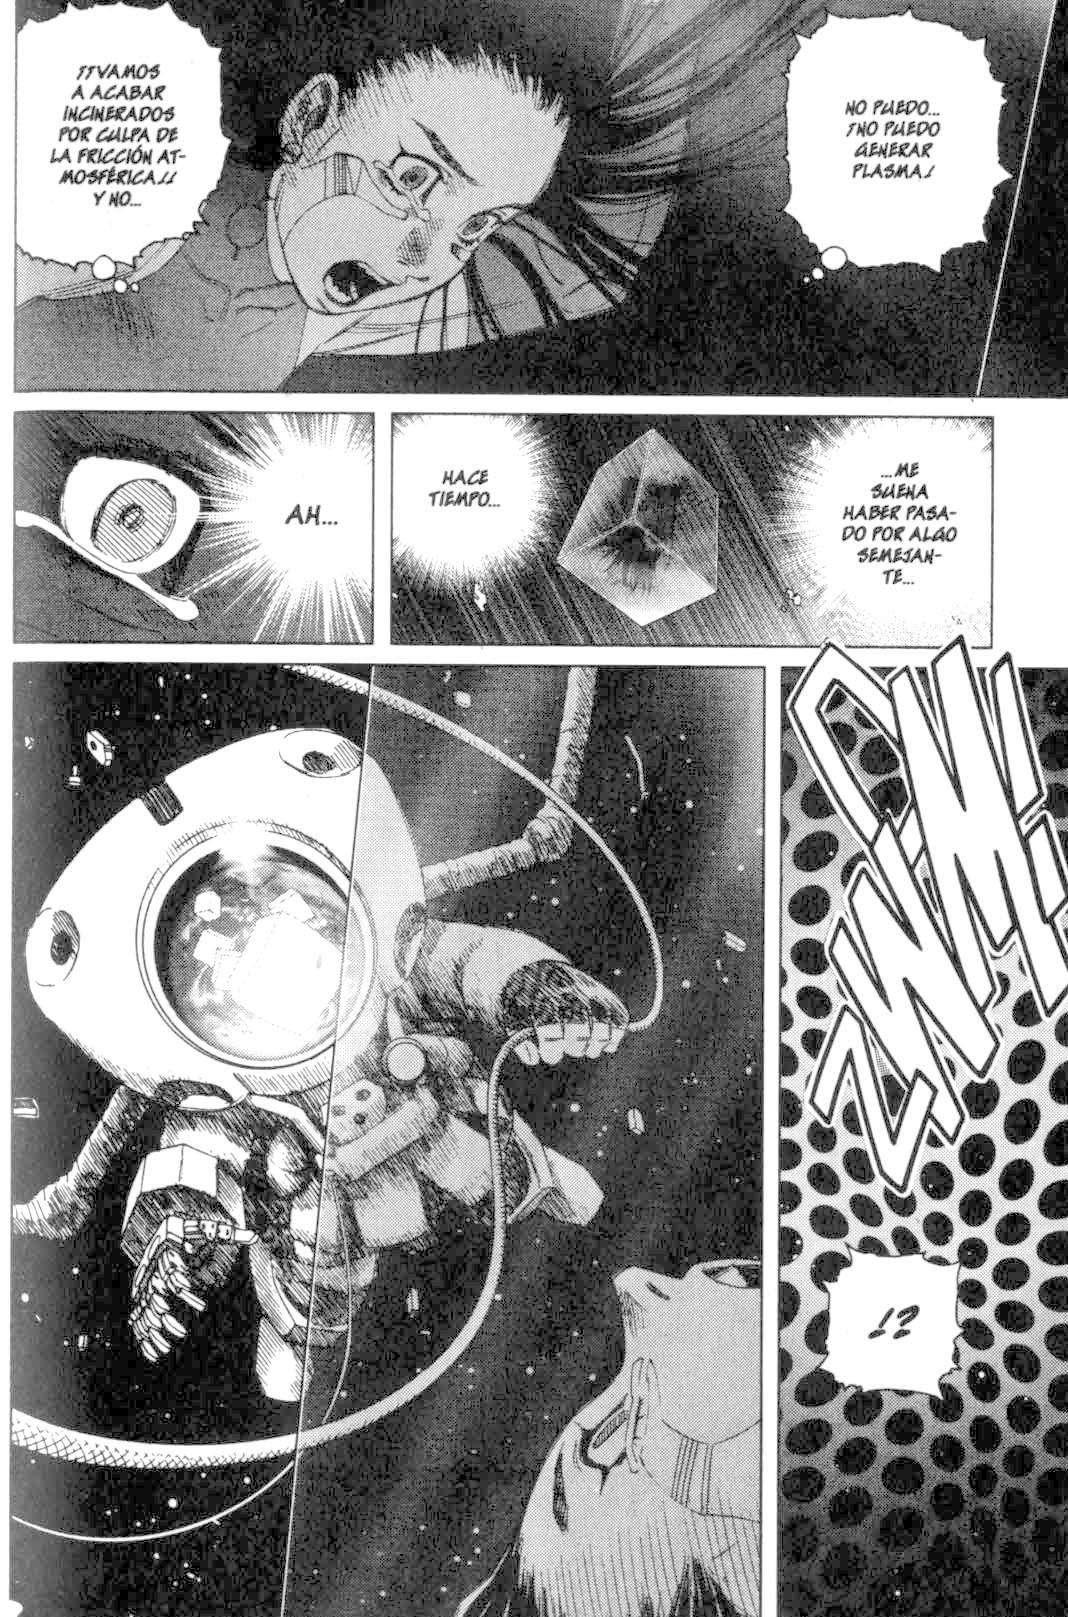 http://c5.ninemanga.com/es_manga/pic2/1/15873/523541/e351b41583cf0558a8e7356f85502cf7.jpg Page 3